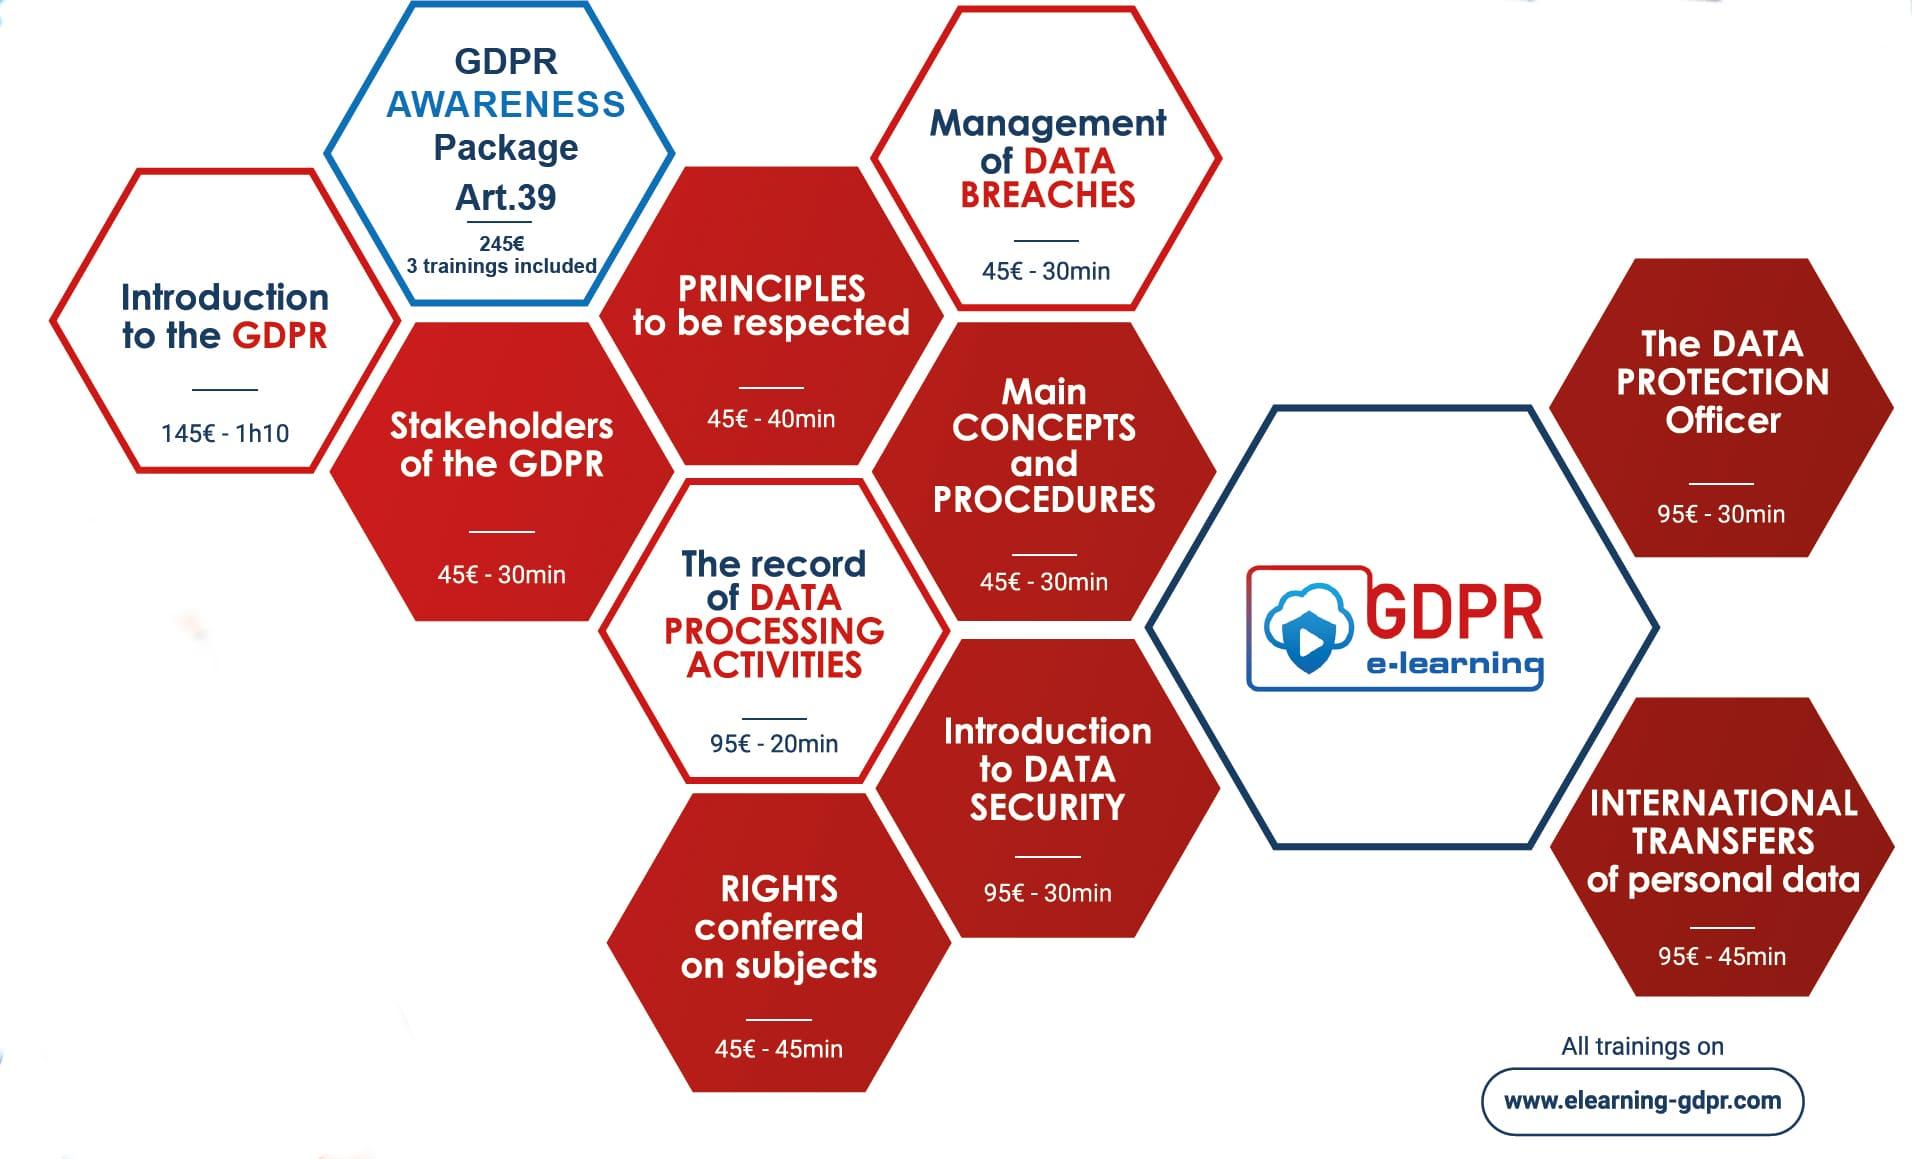 GDPR e-learning trainings